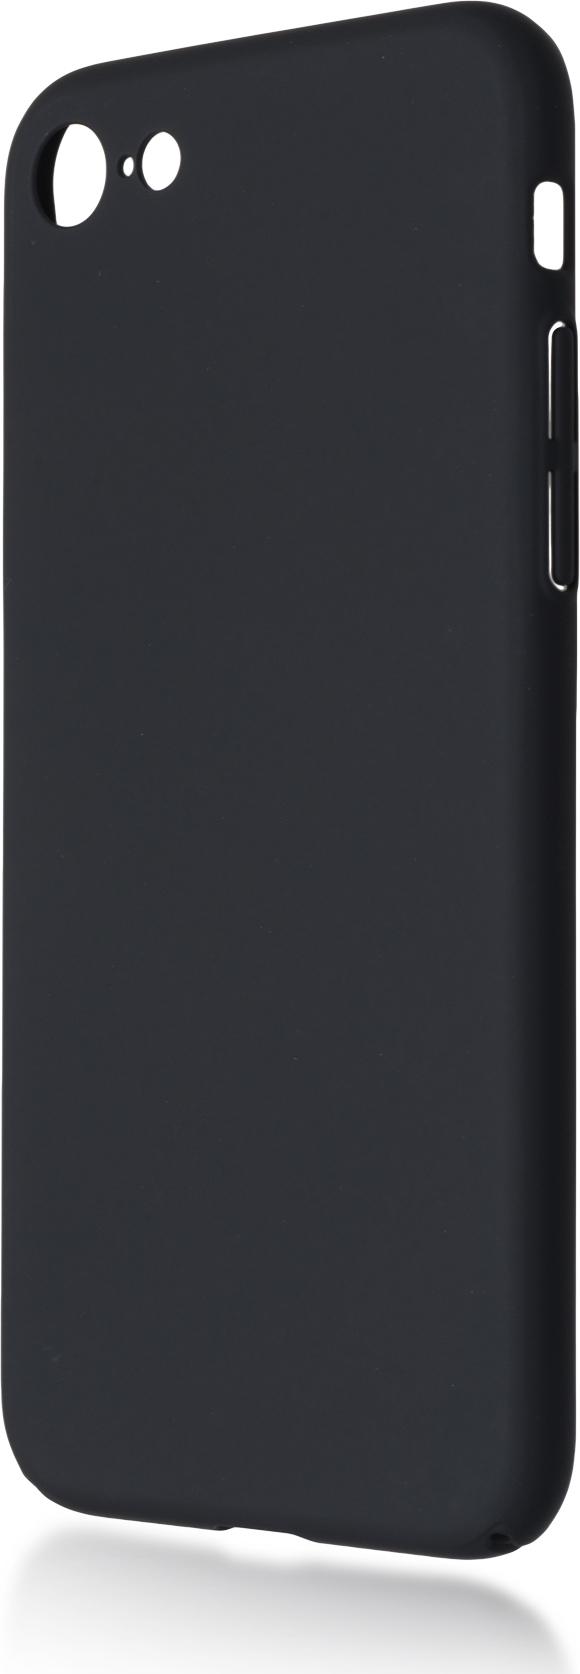 Чехол Brosco 4Side Soft-Touch для Apple iPhone 7, черный